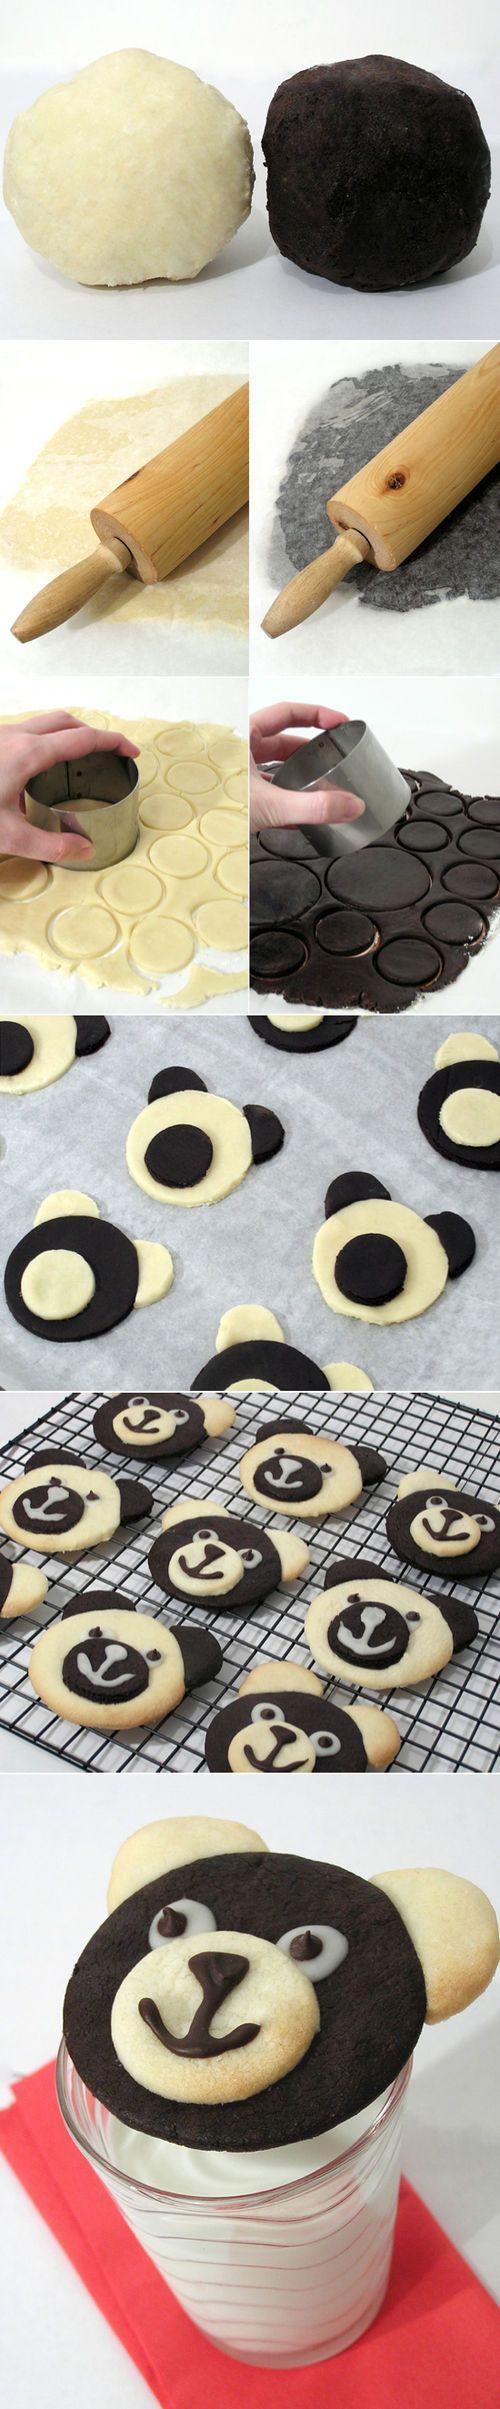 BetXi Bear Cookies :) // penguins could be similar